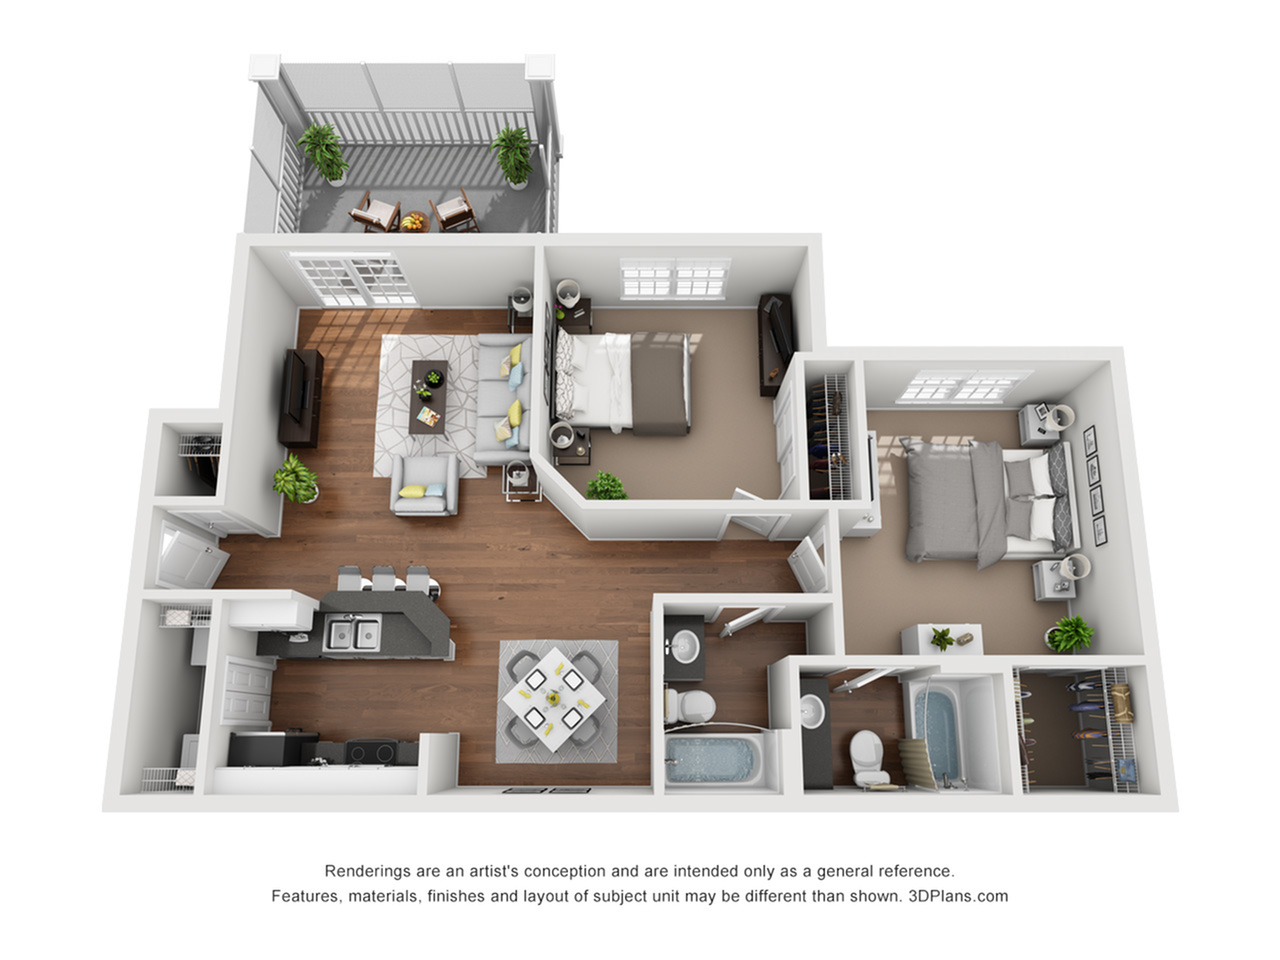 Earth Balcony 949 Square Feet Two Bedroom | Two Bathroom